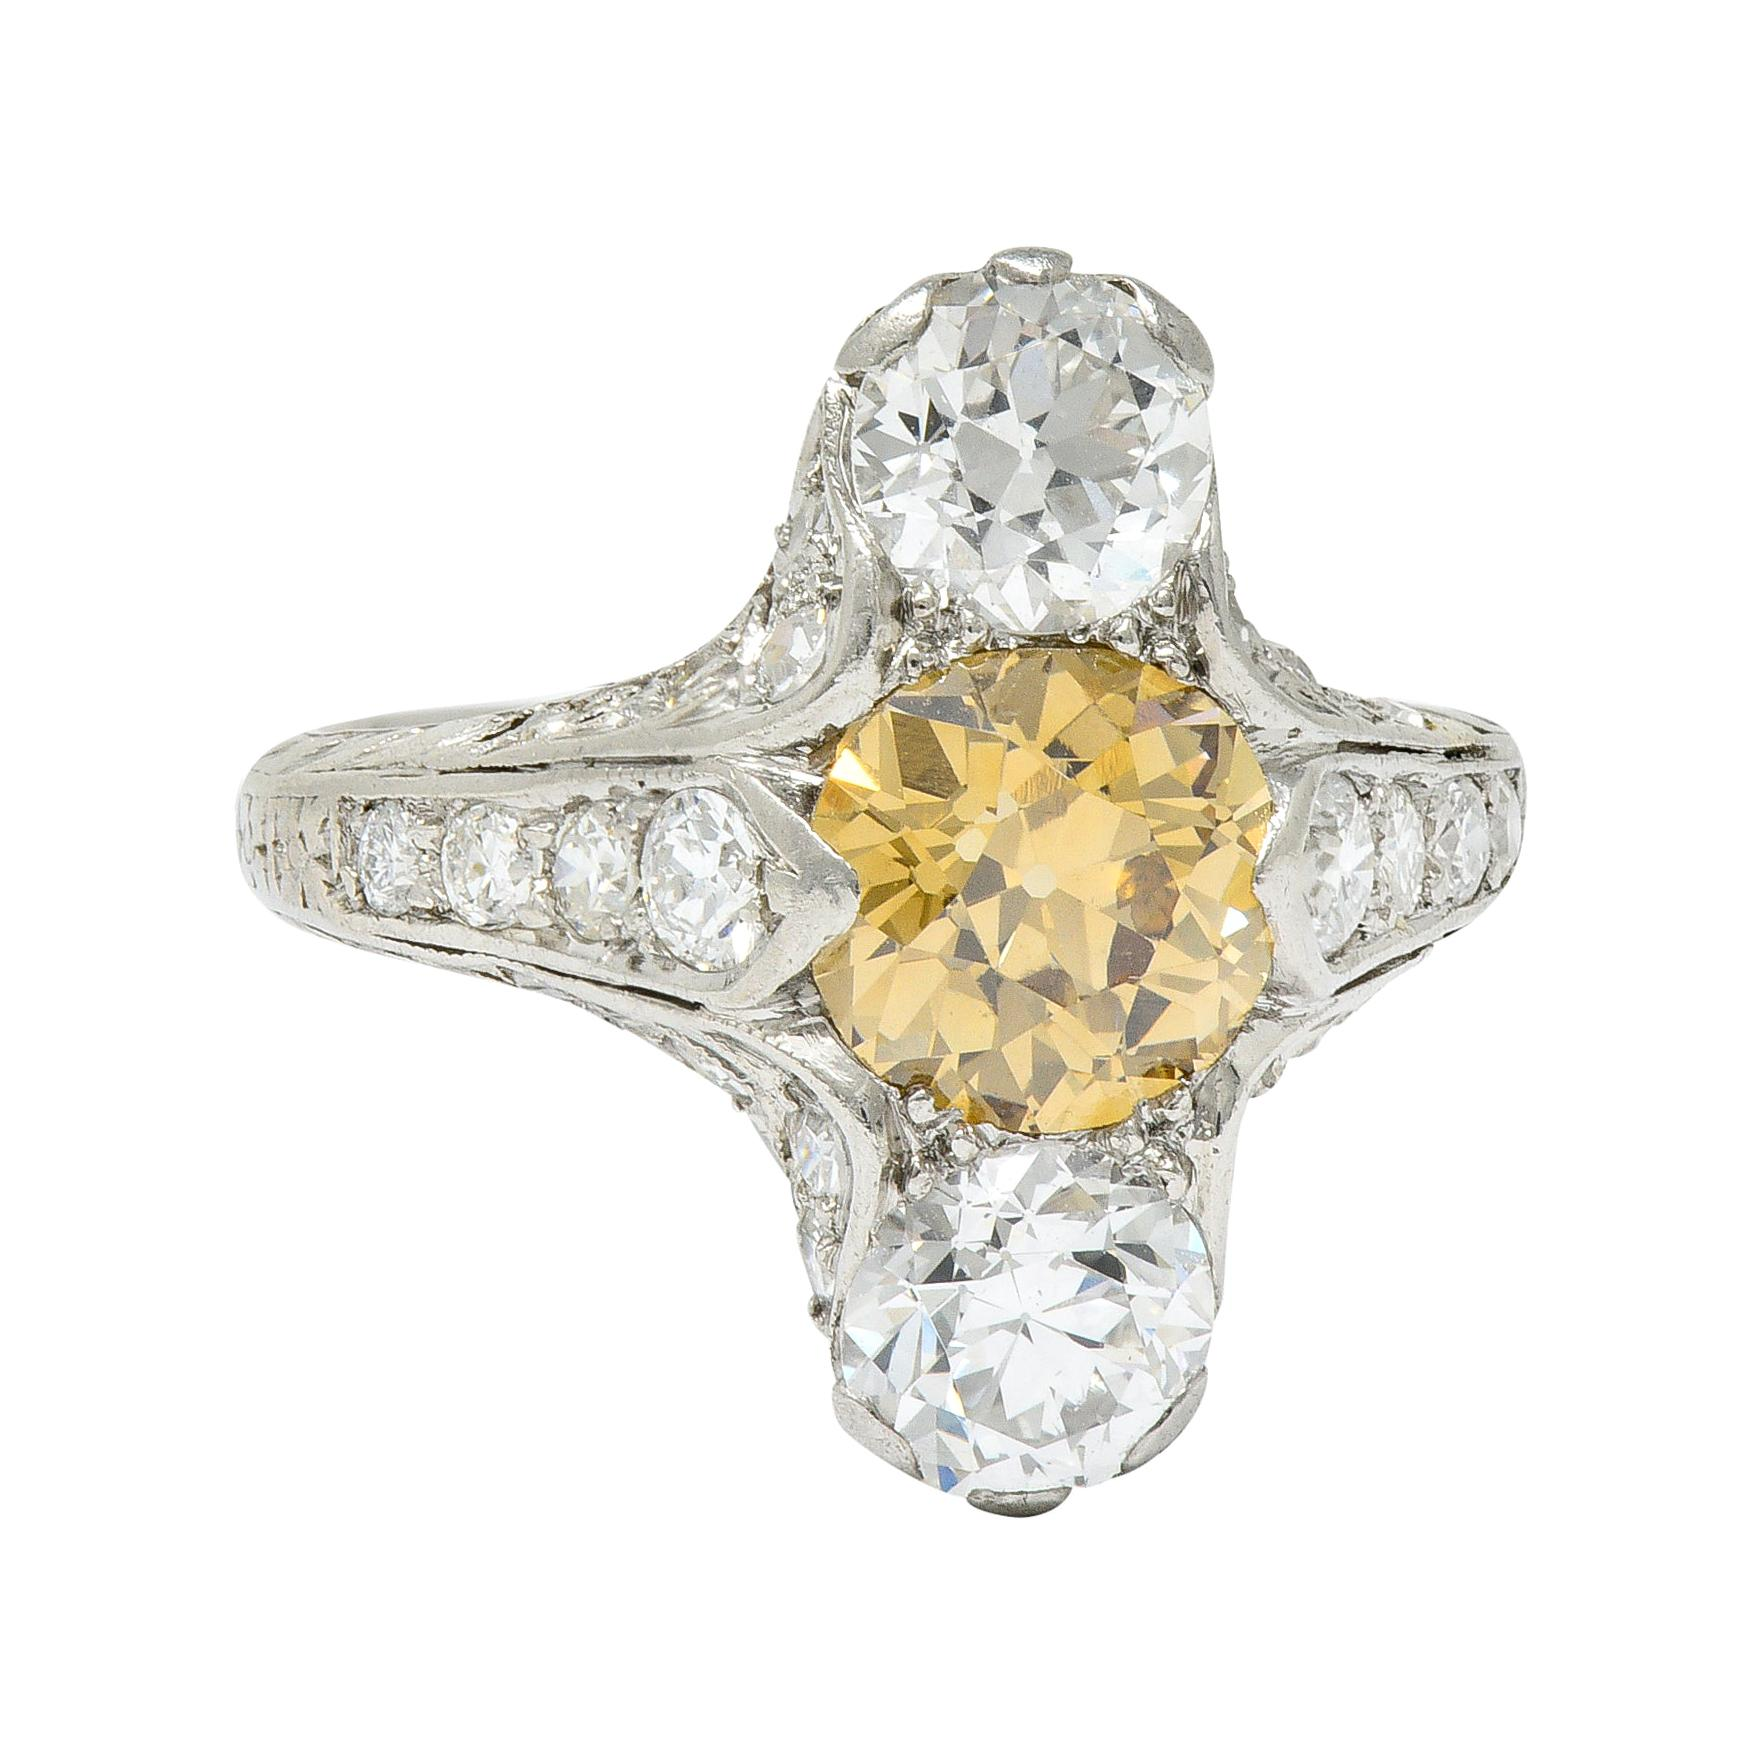 Art Deco 2.62 Carat Fancy Diamond & White Diamond Platinum Dinner Ring